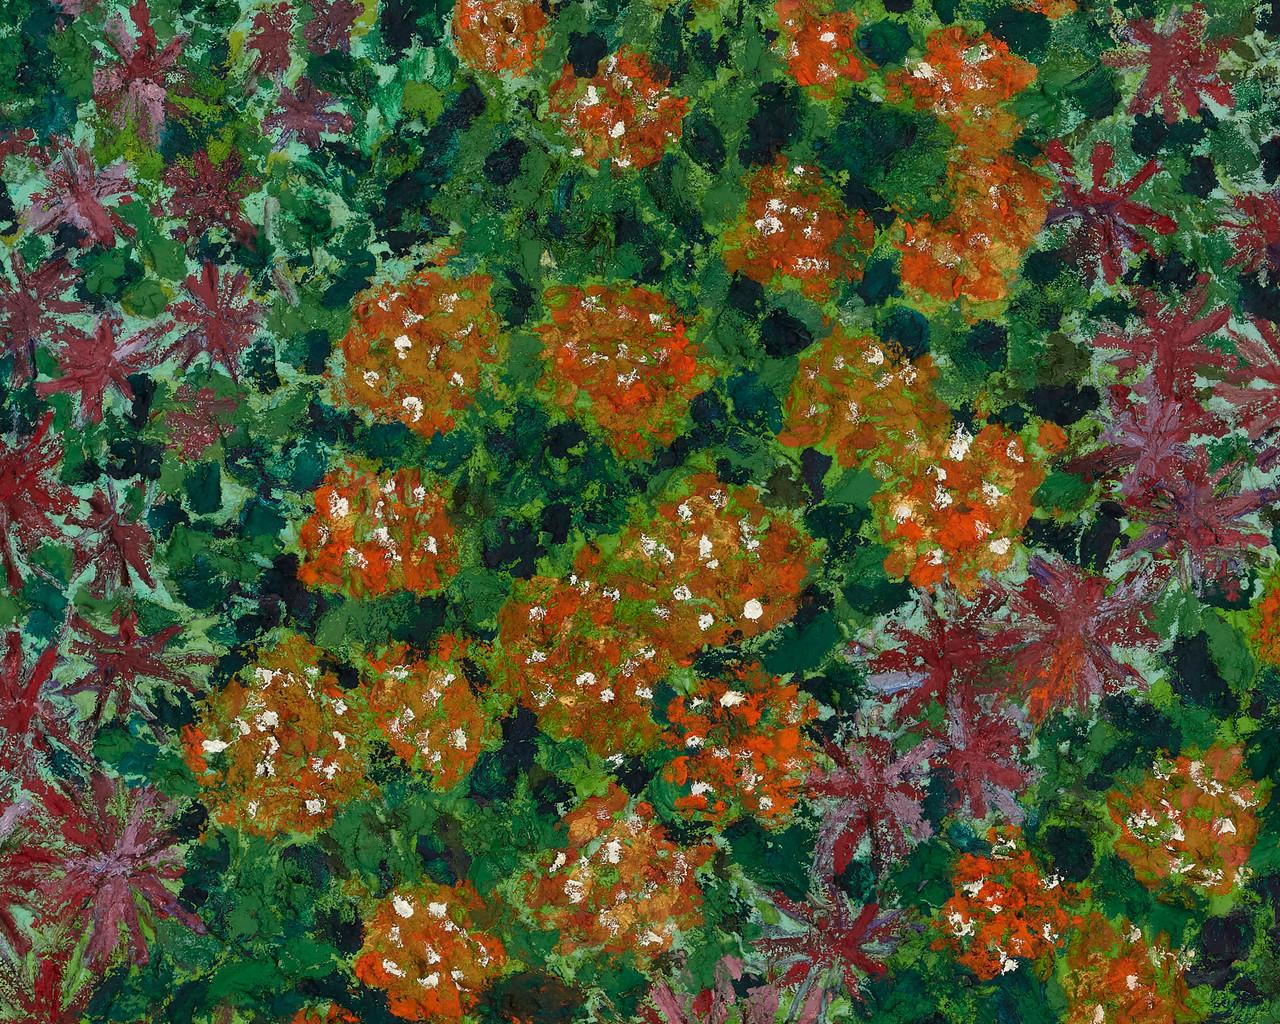 jarrett key alabama flowers daytime